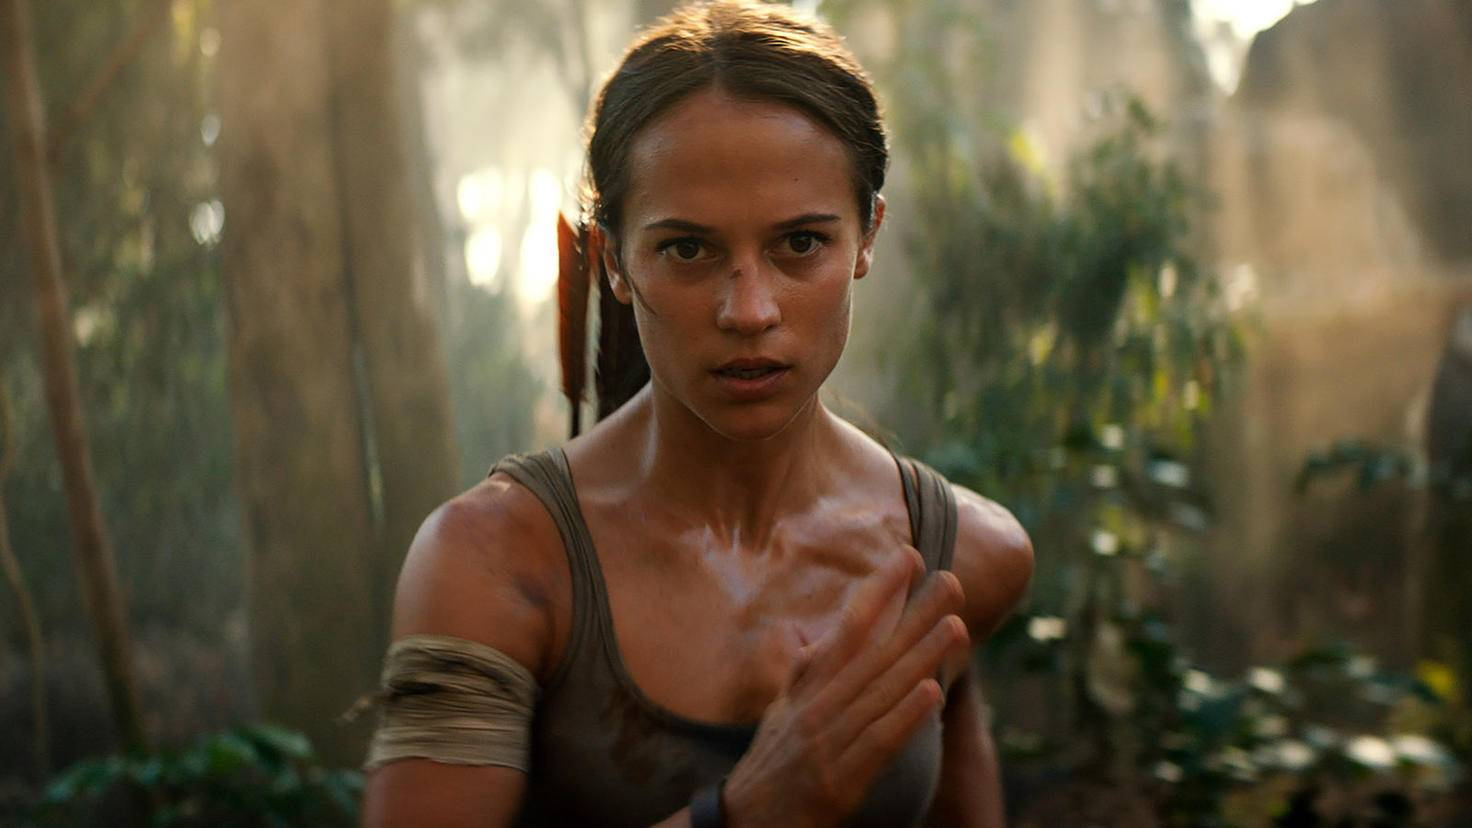 Alicia Vikander verpasst Lara Croft ein komplett neues Image.